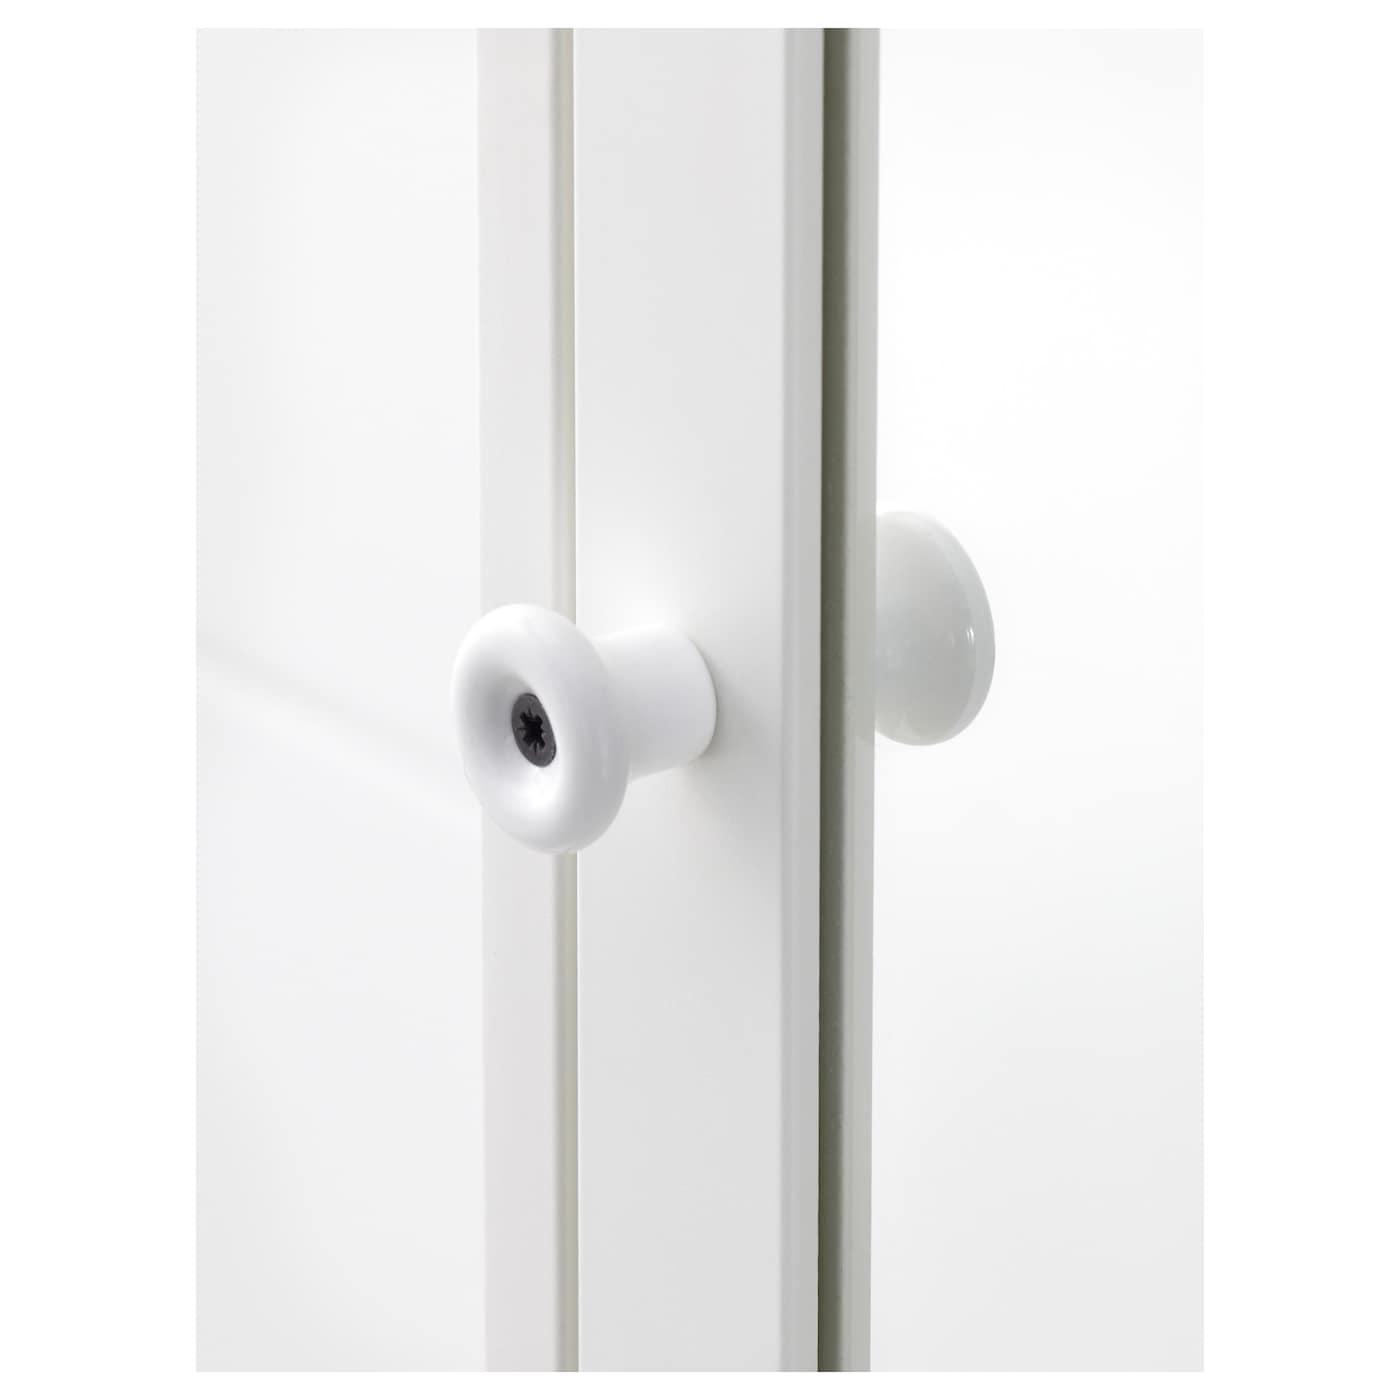 silver n armoire avec porte miroir blanc 40 x 25 x 172 cm ikea. Black Bedroom Furniture Sets. Home Design Ideas